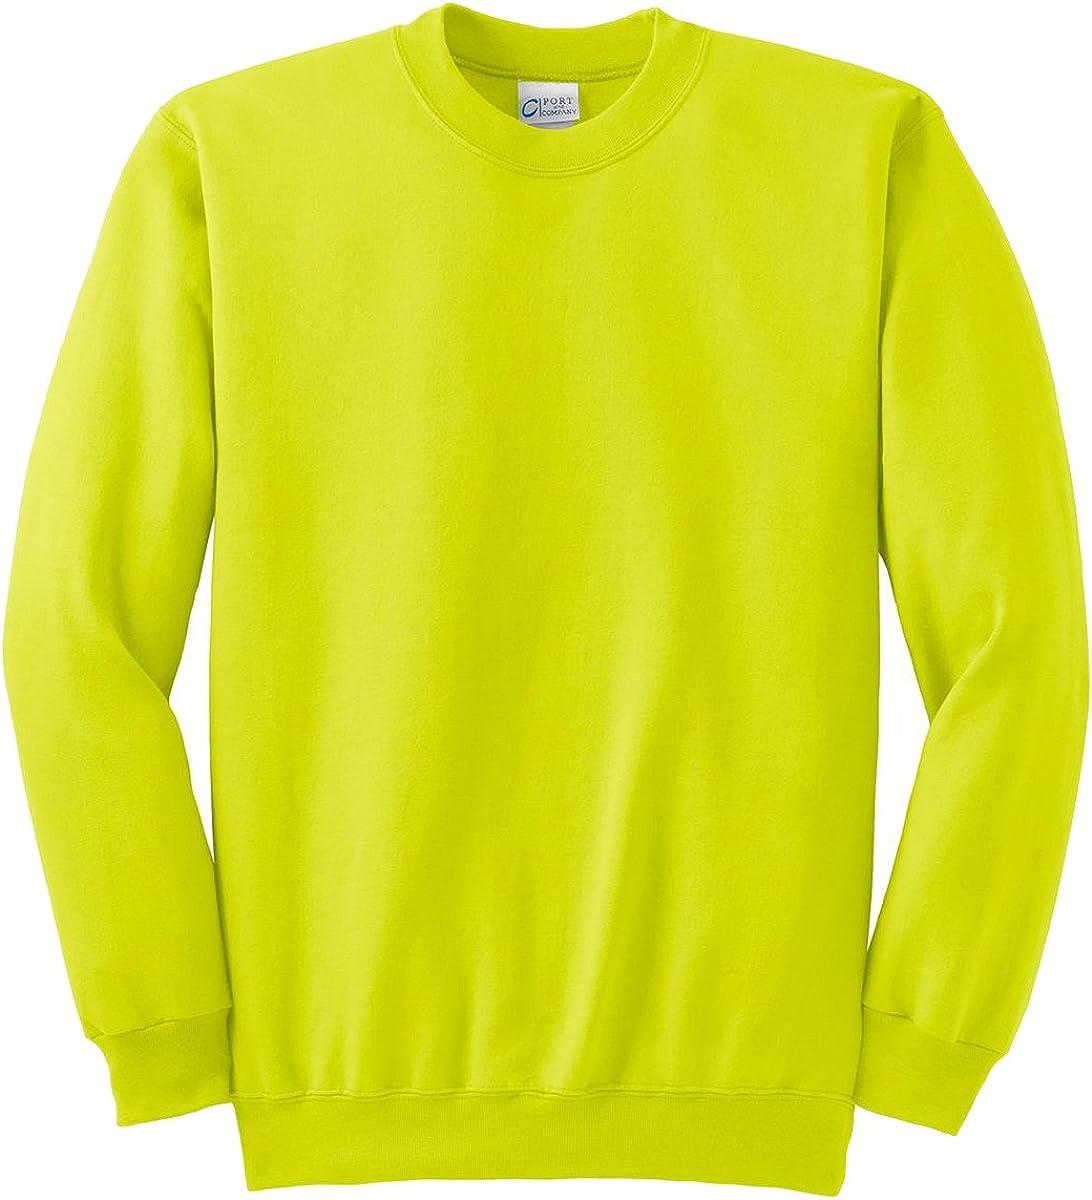 Port & Company Tall Ultimate Crewneck Sweatshirt>4XLT Safety Green PC90T